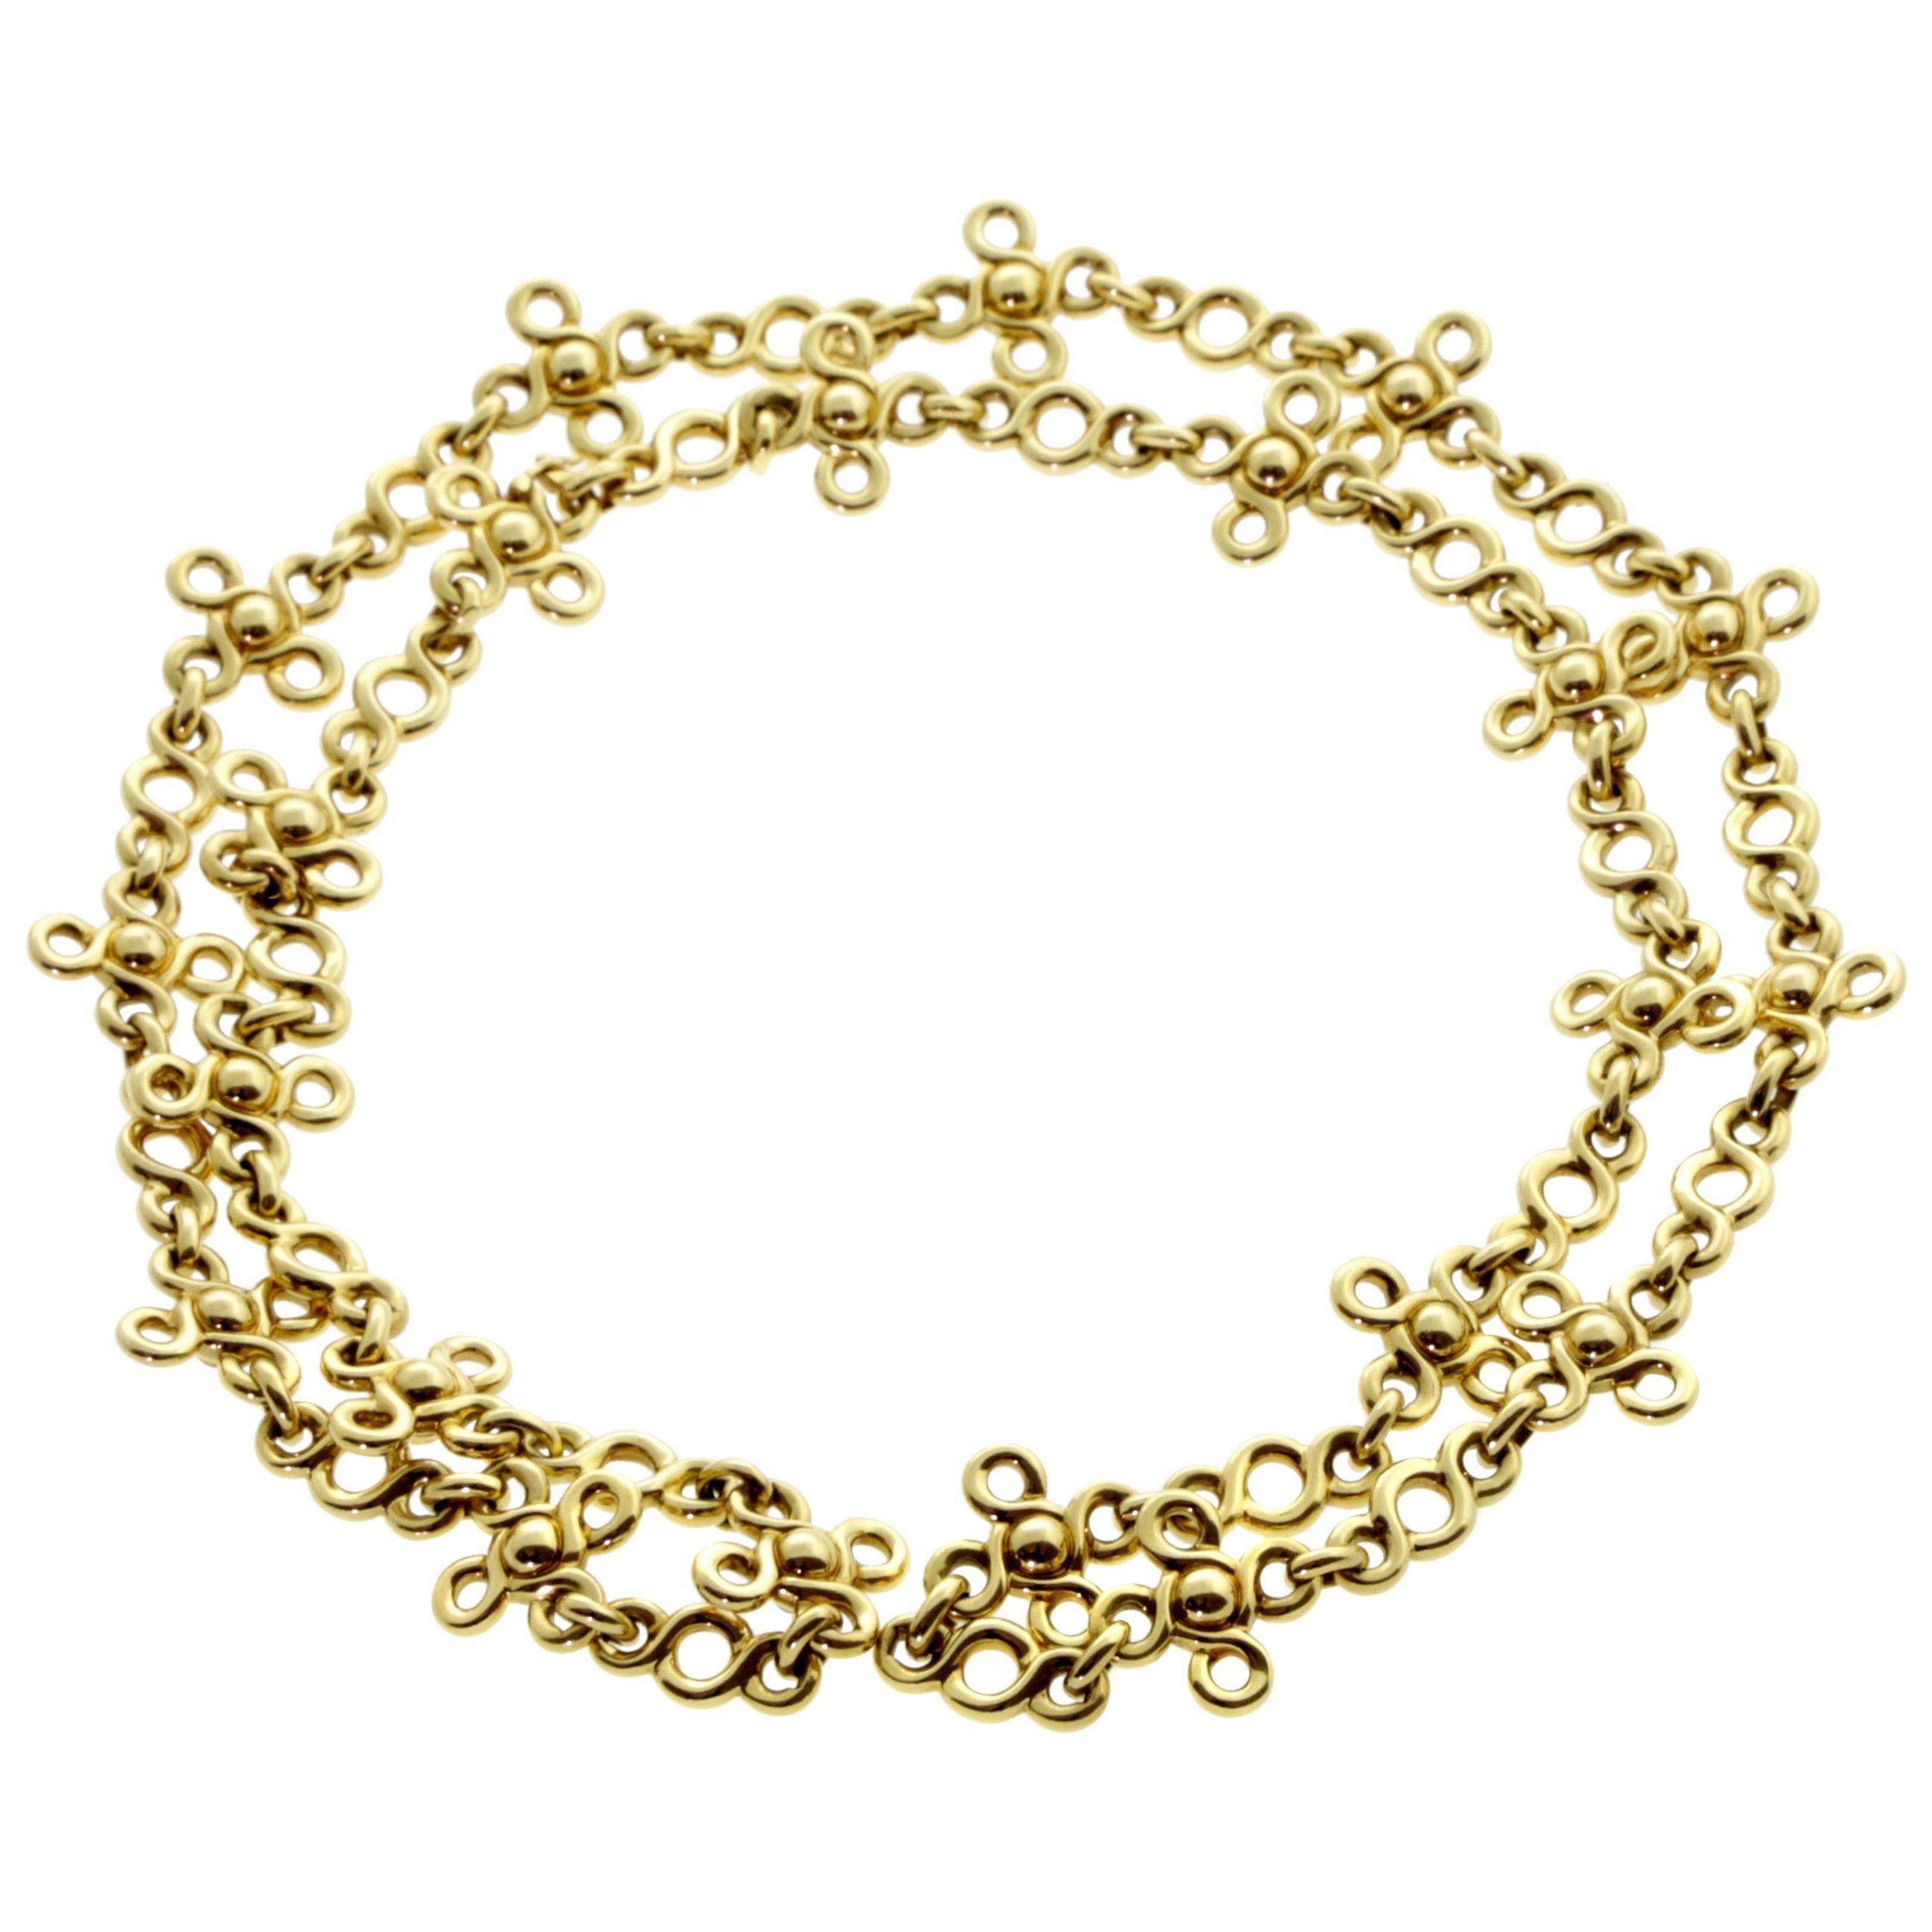 Chanel Gemstone Gold Sautoir Necklace